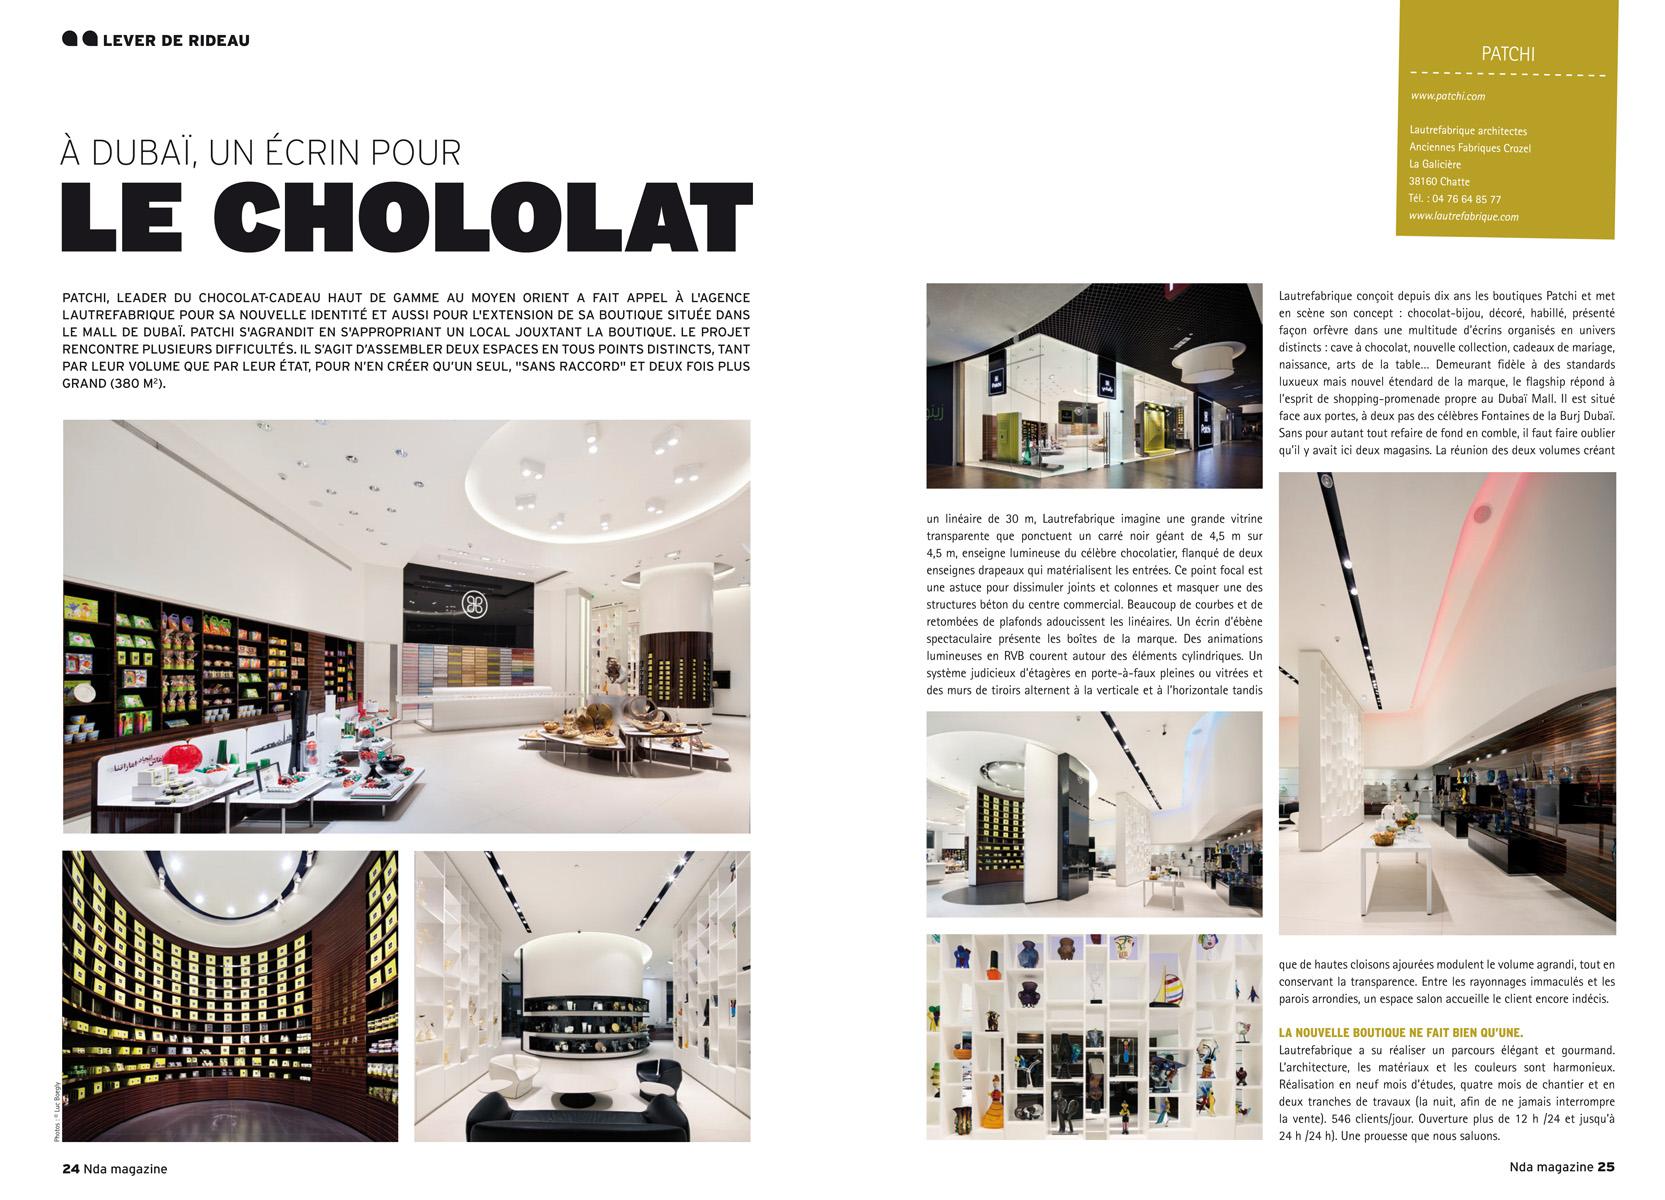 Lautrefabrique architectes nda magazine 13 for Architectural design magazine